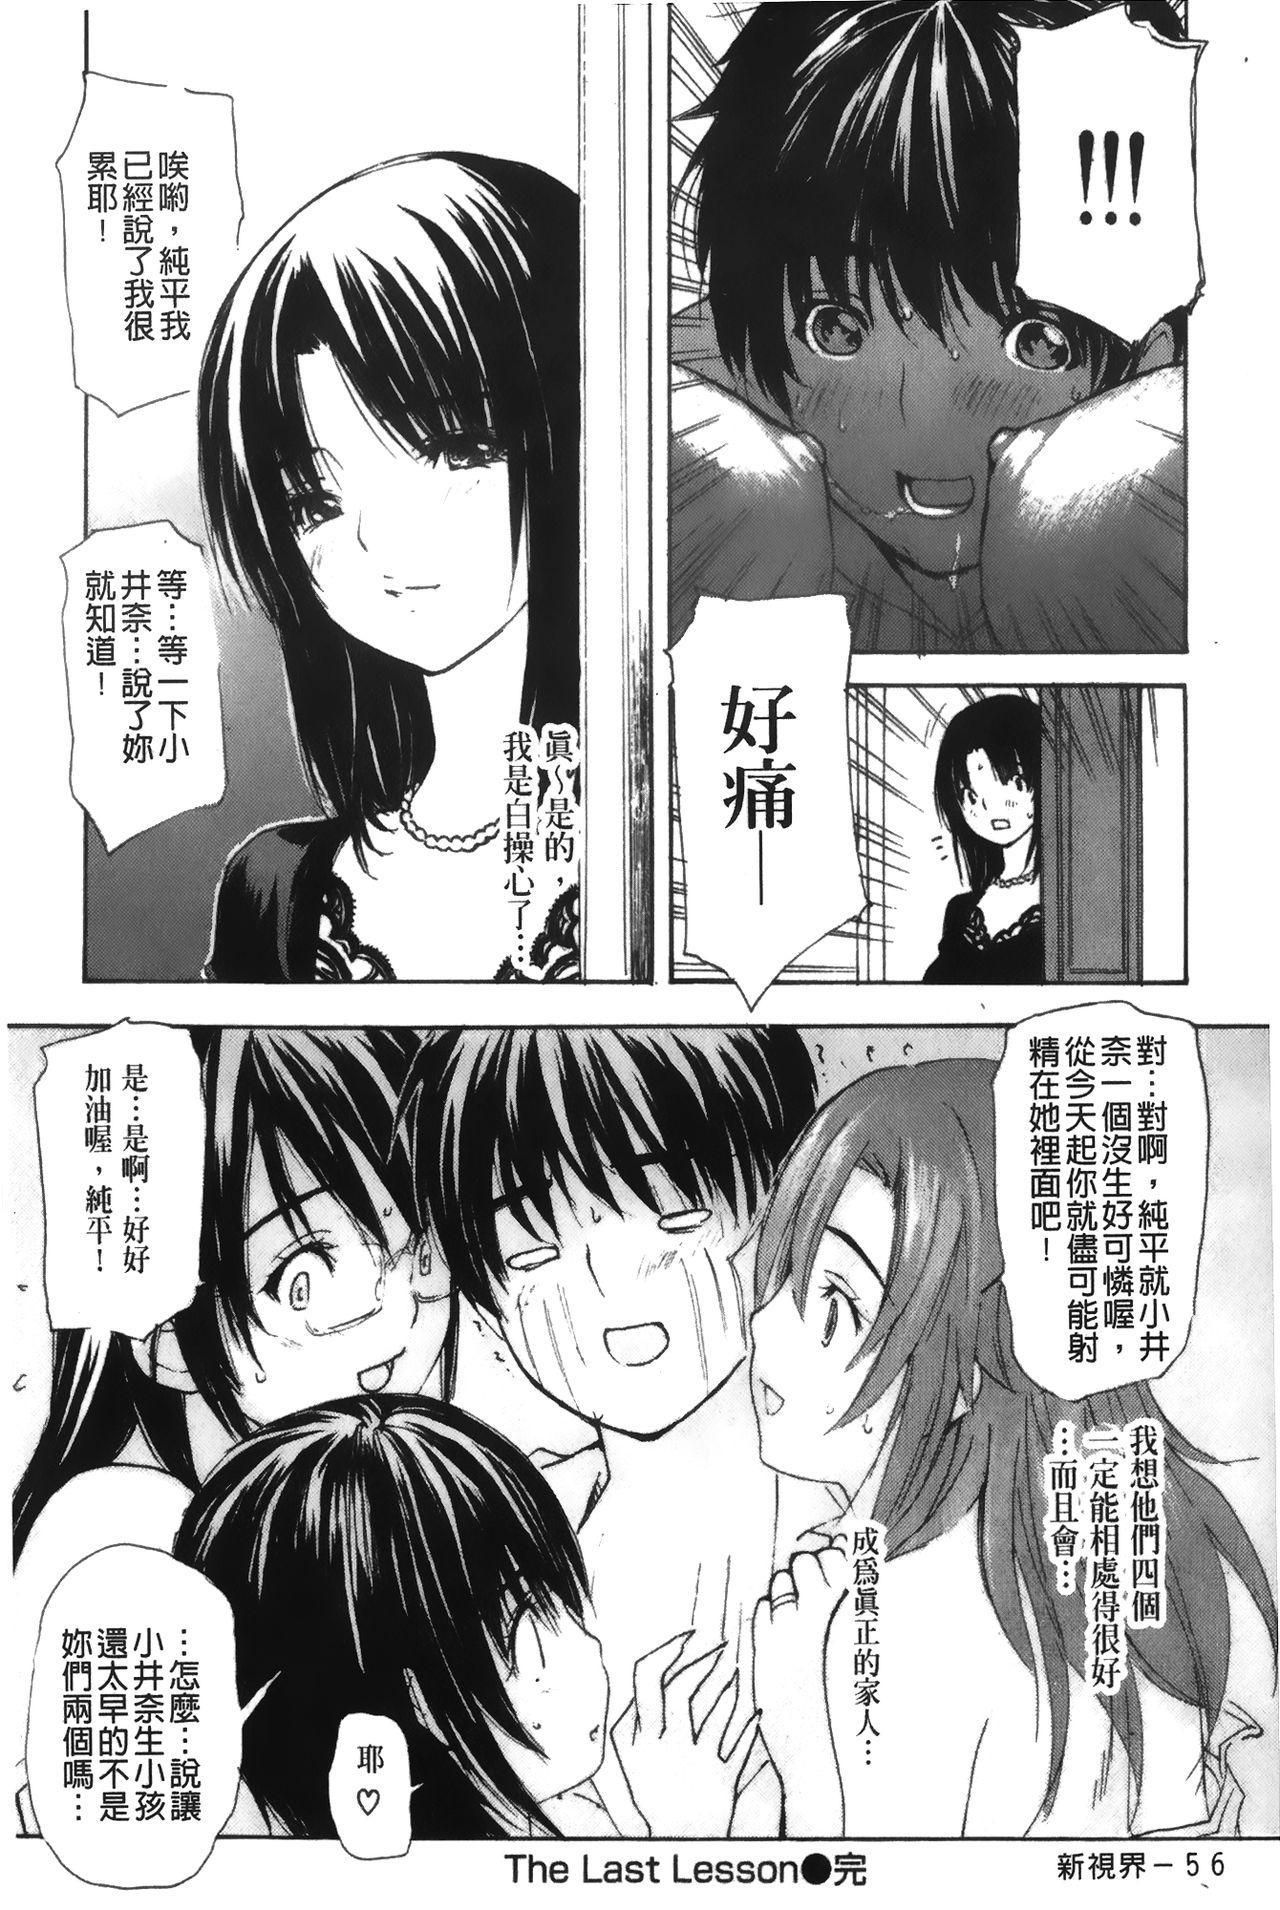 Tonari no Minano Sensei 4 | 隔壁的美奈乃老師 4 221